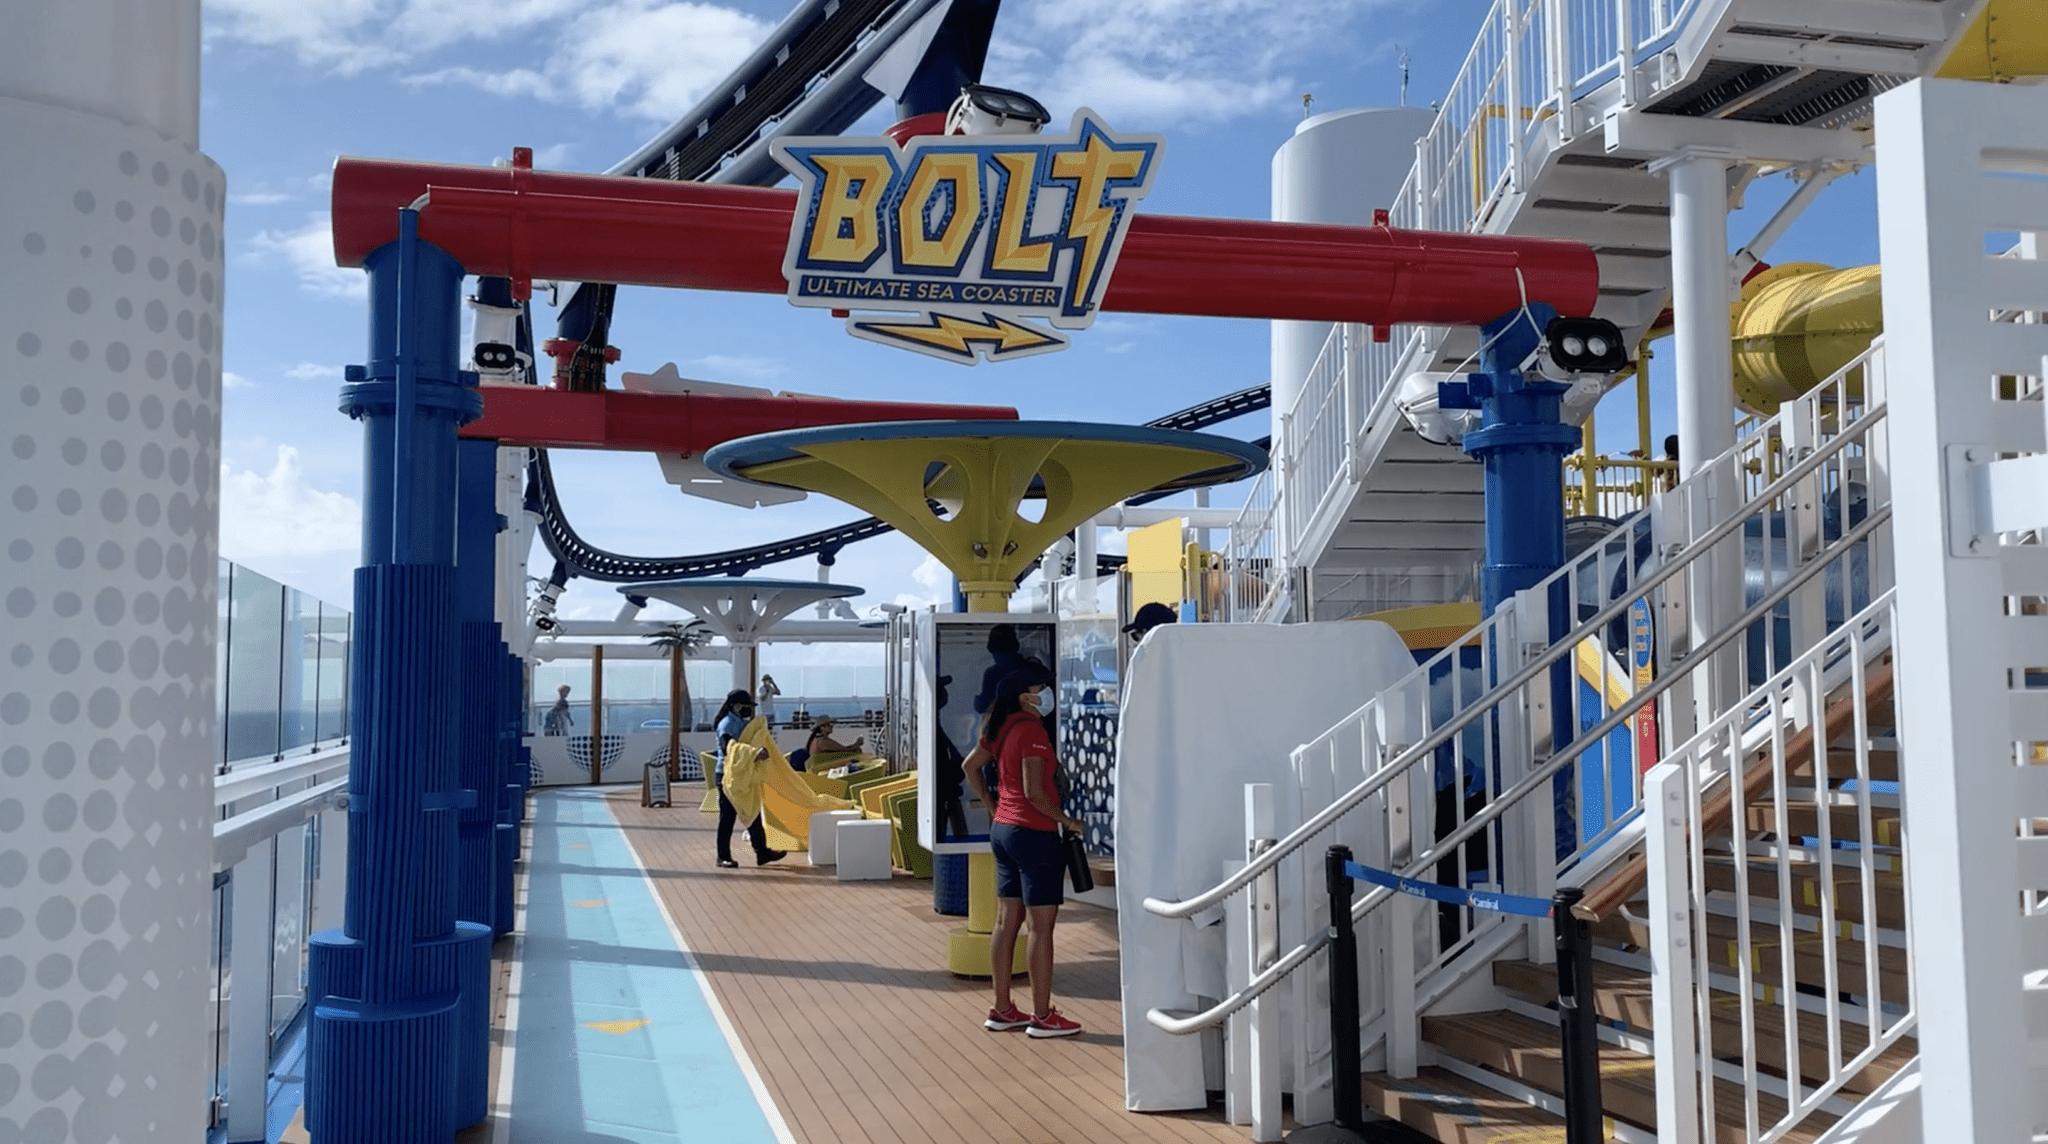 bolt roller coaster closed